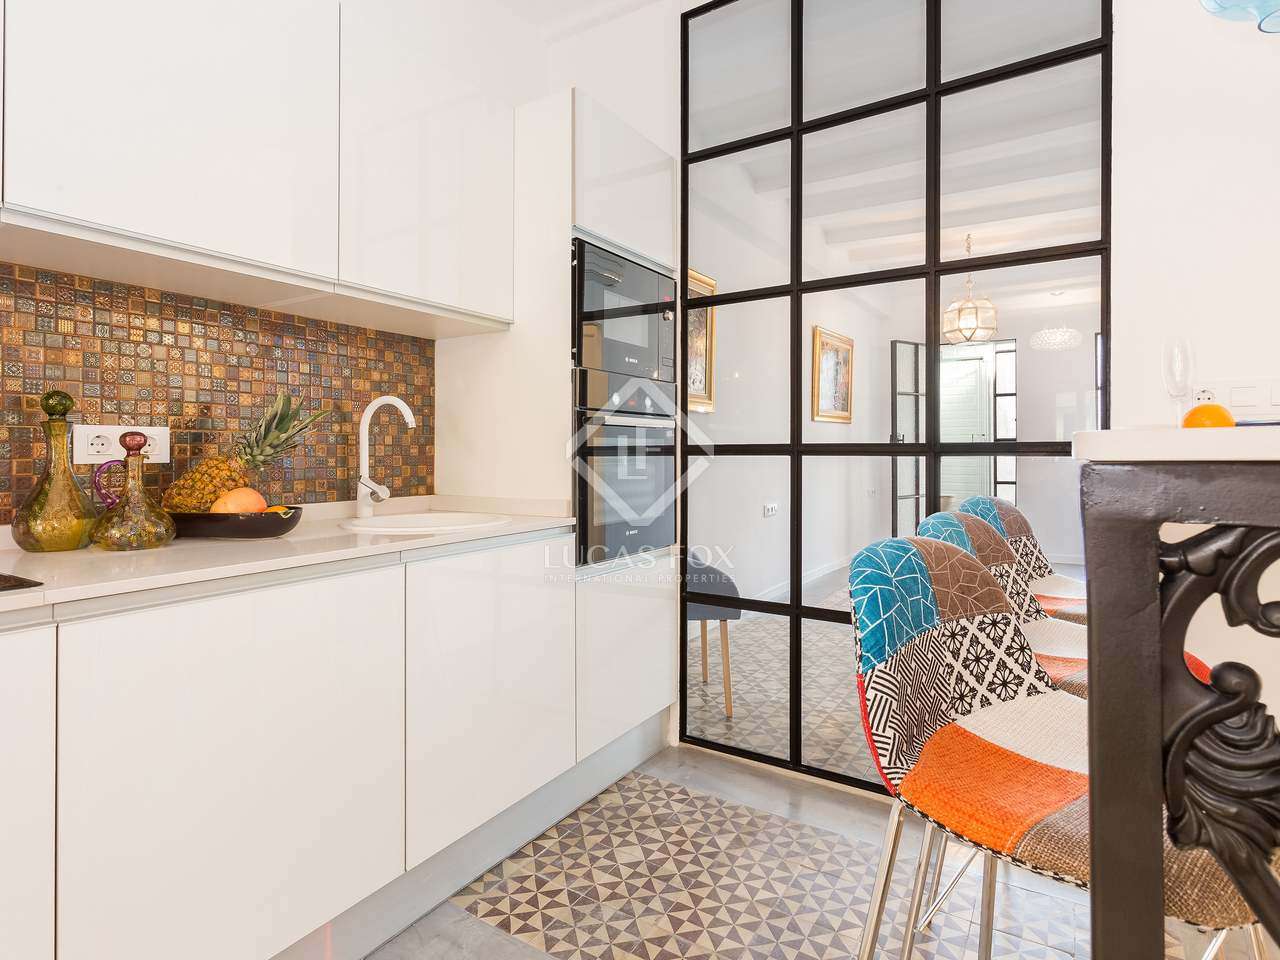 Appartement de 82m a vendre g tico barcelone for Appartement avec piscine barcelone